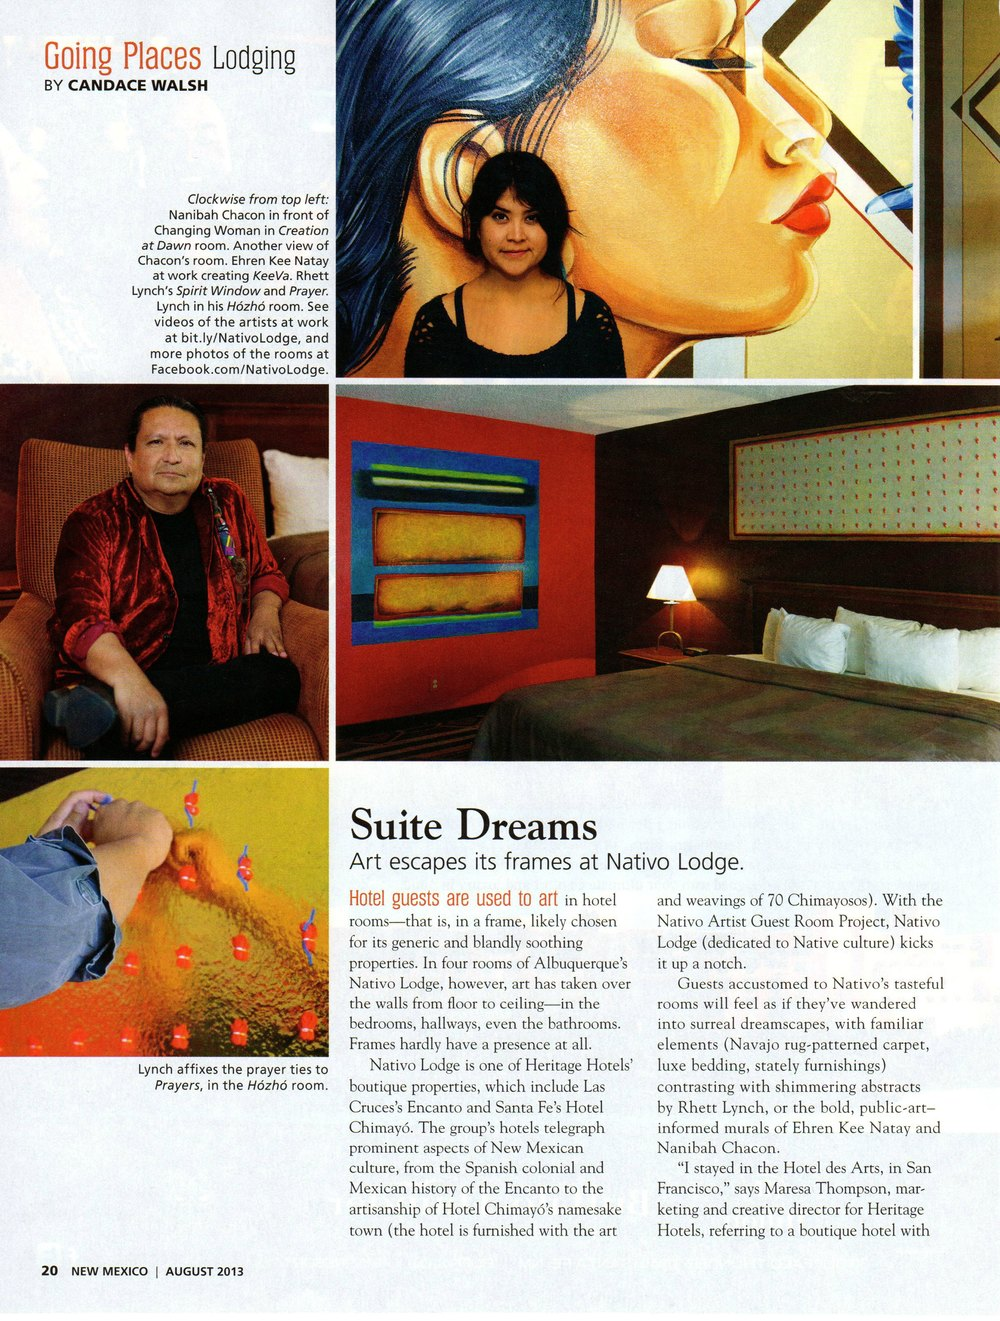 New Mexico Magazine August 2013 p.20.jpg